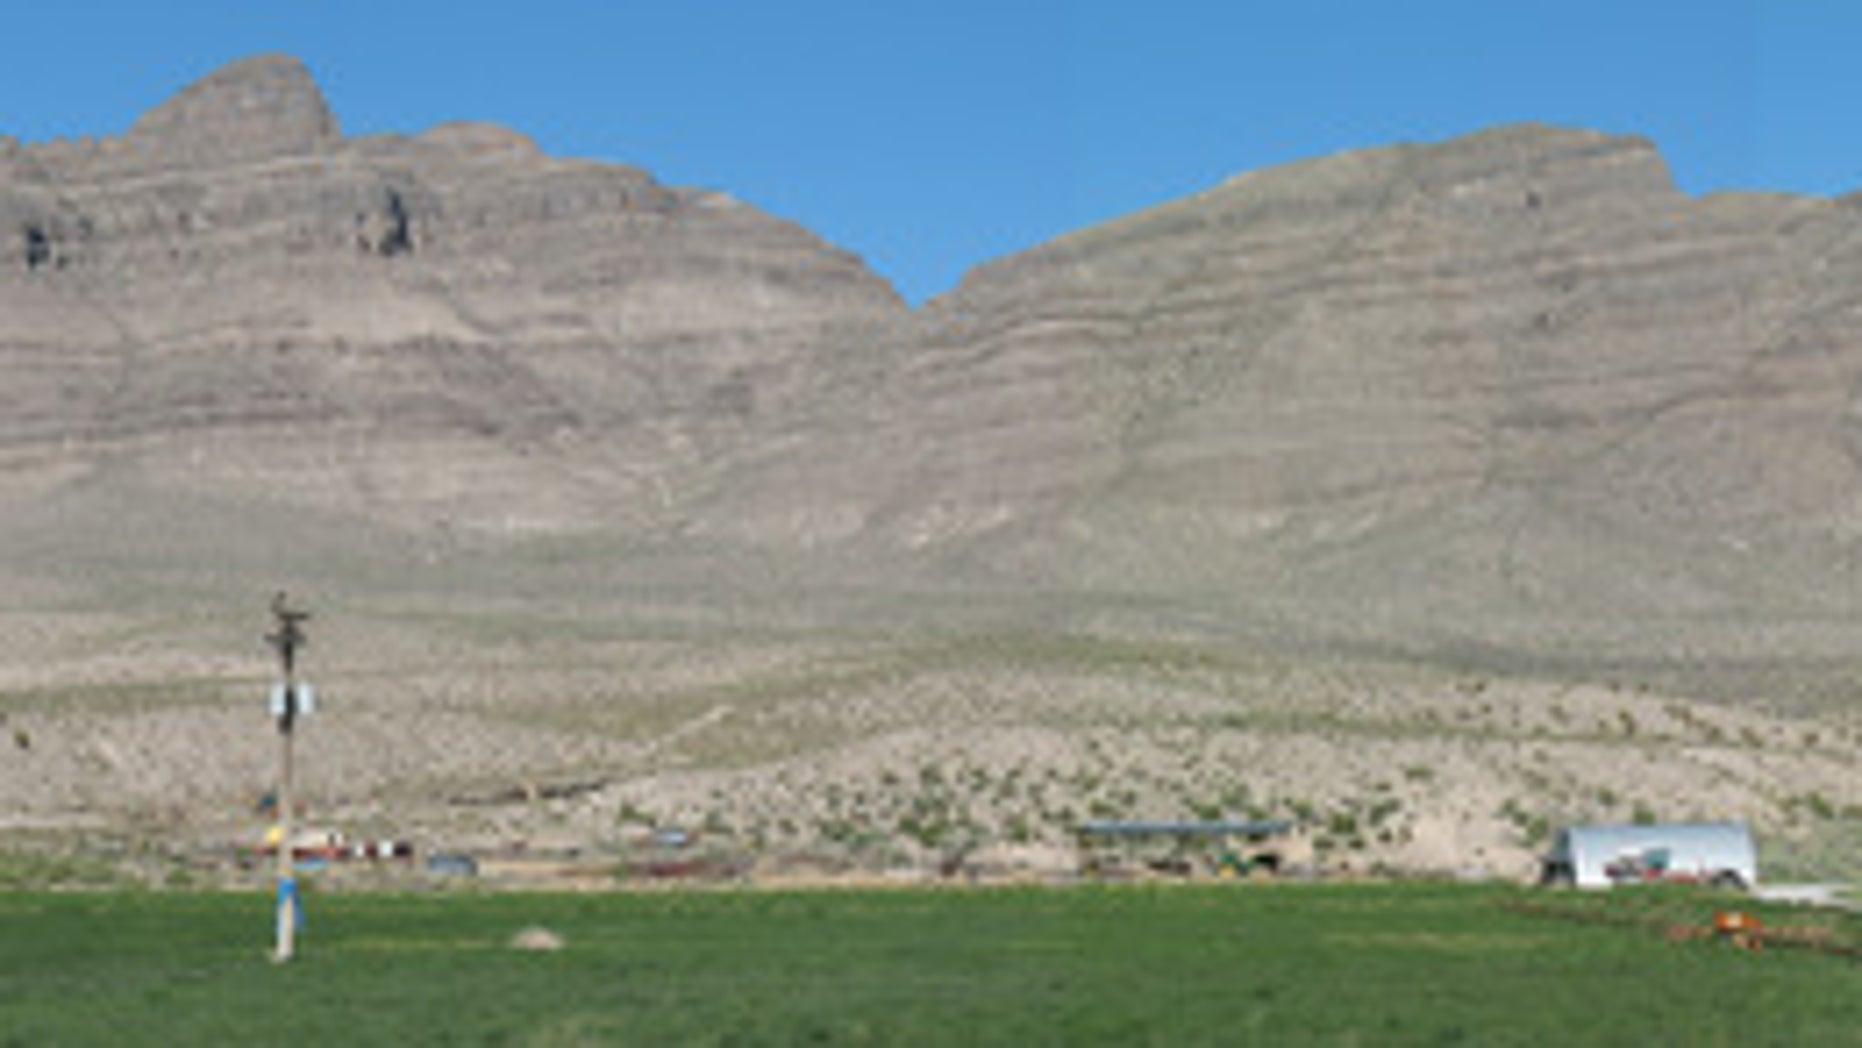 Alamo impact crater rocks exposed near Hiko, Nevada.